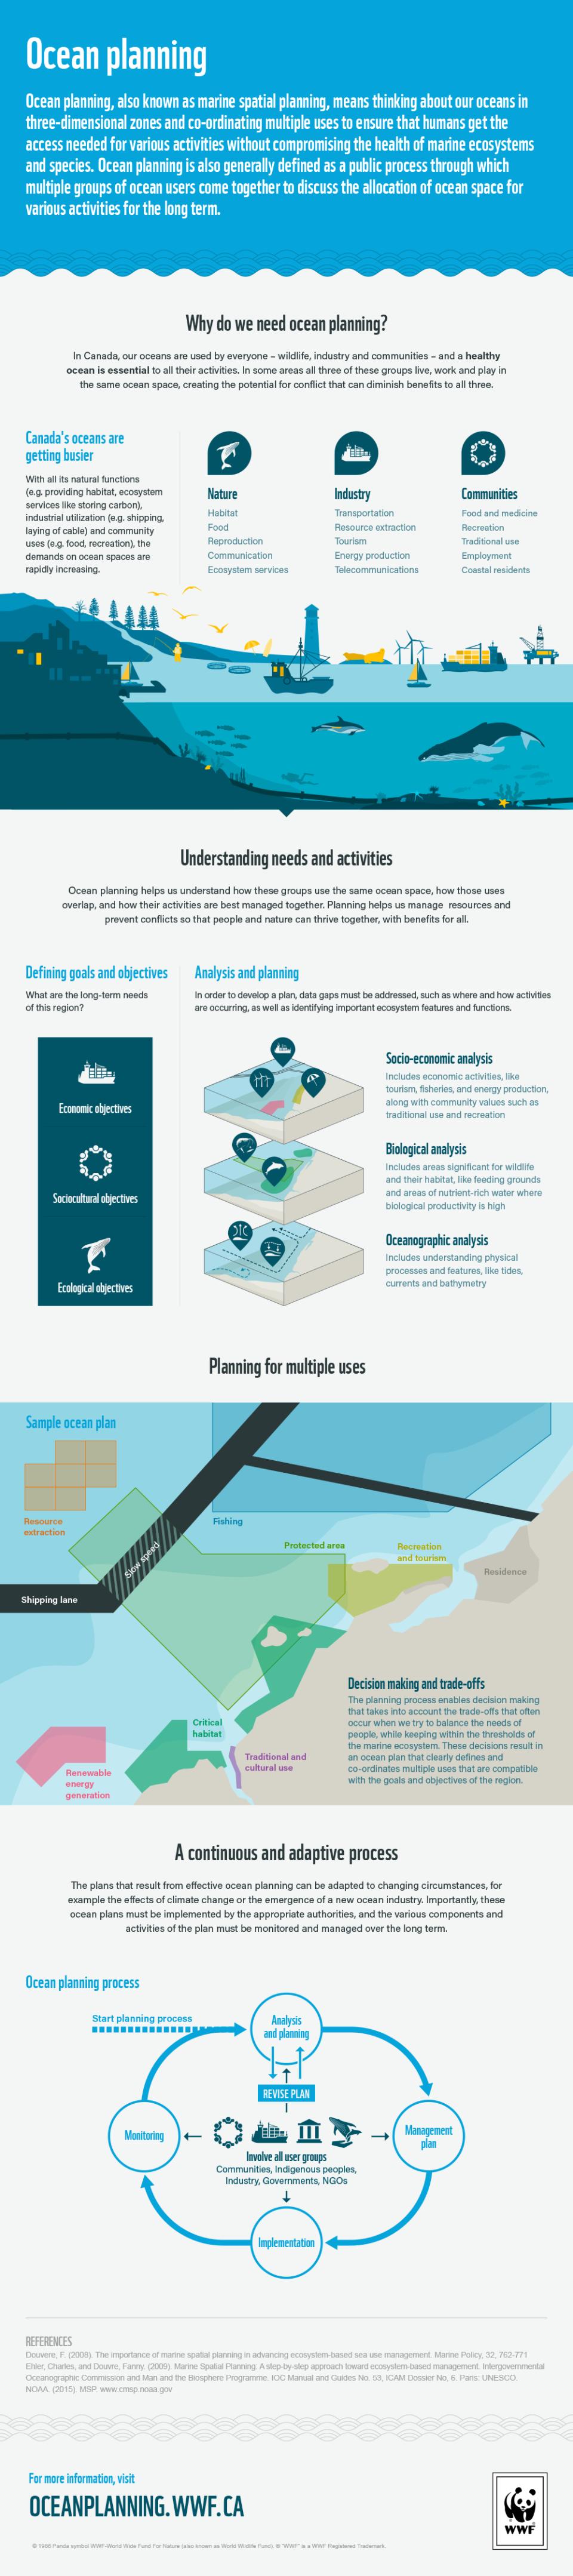 Wwf Oceanplanning Infographic